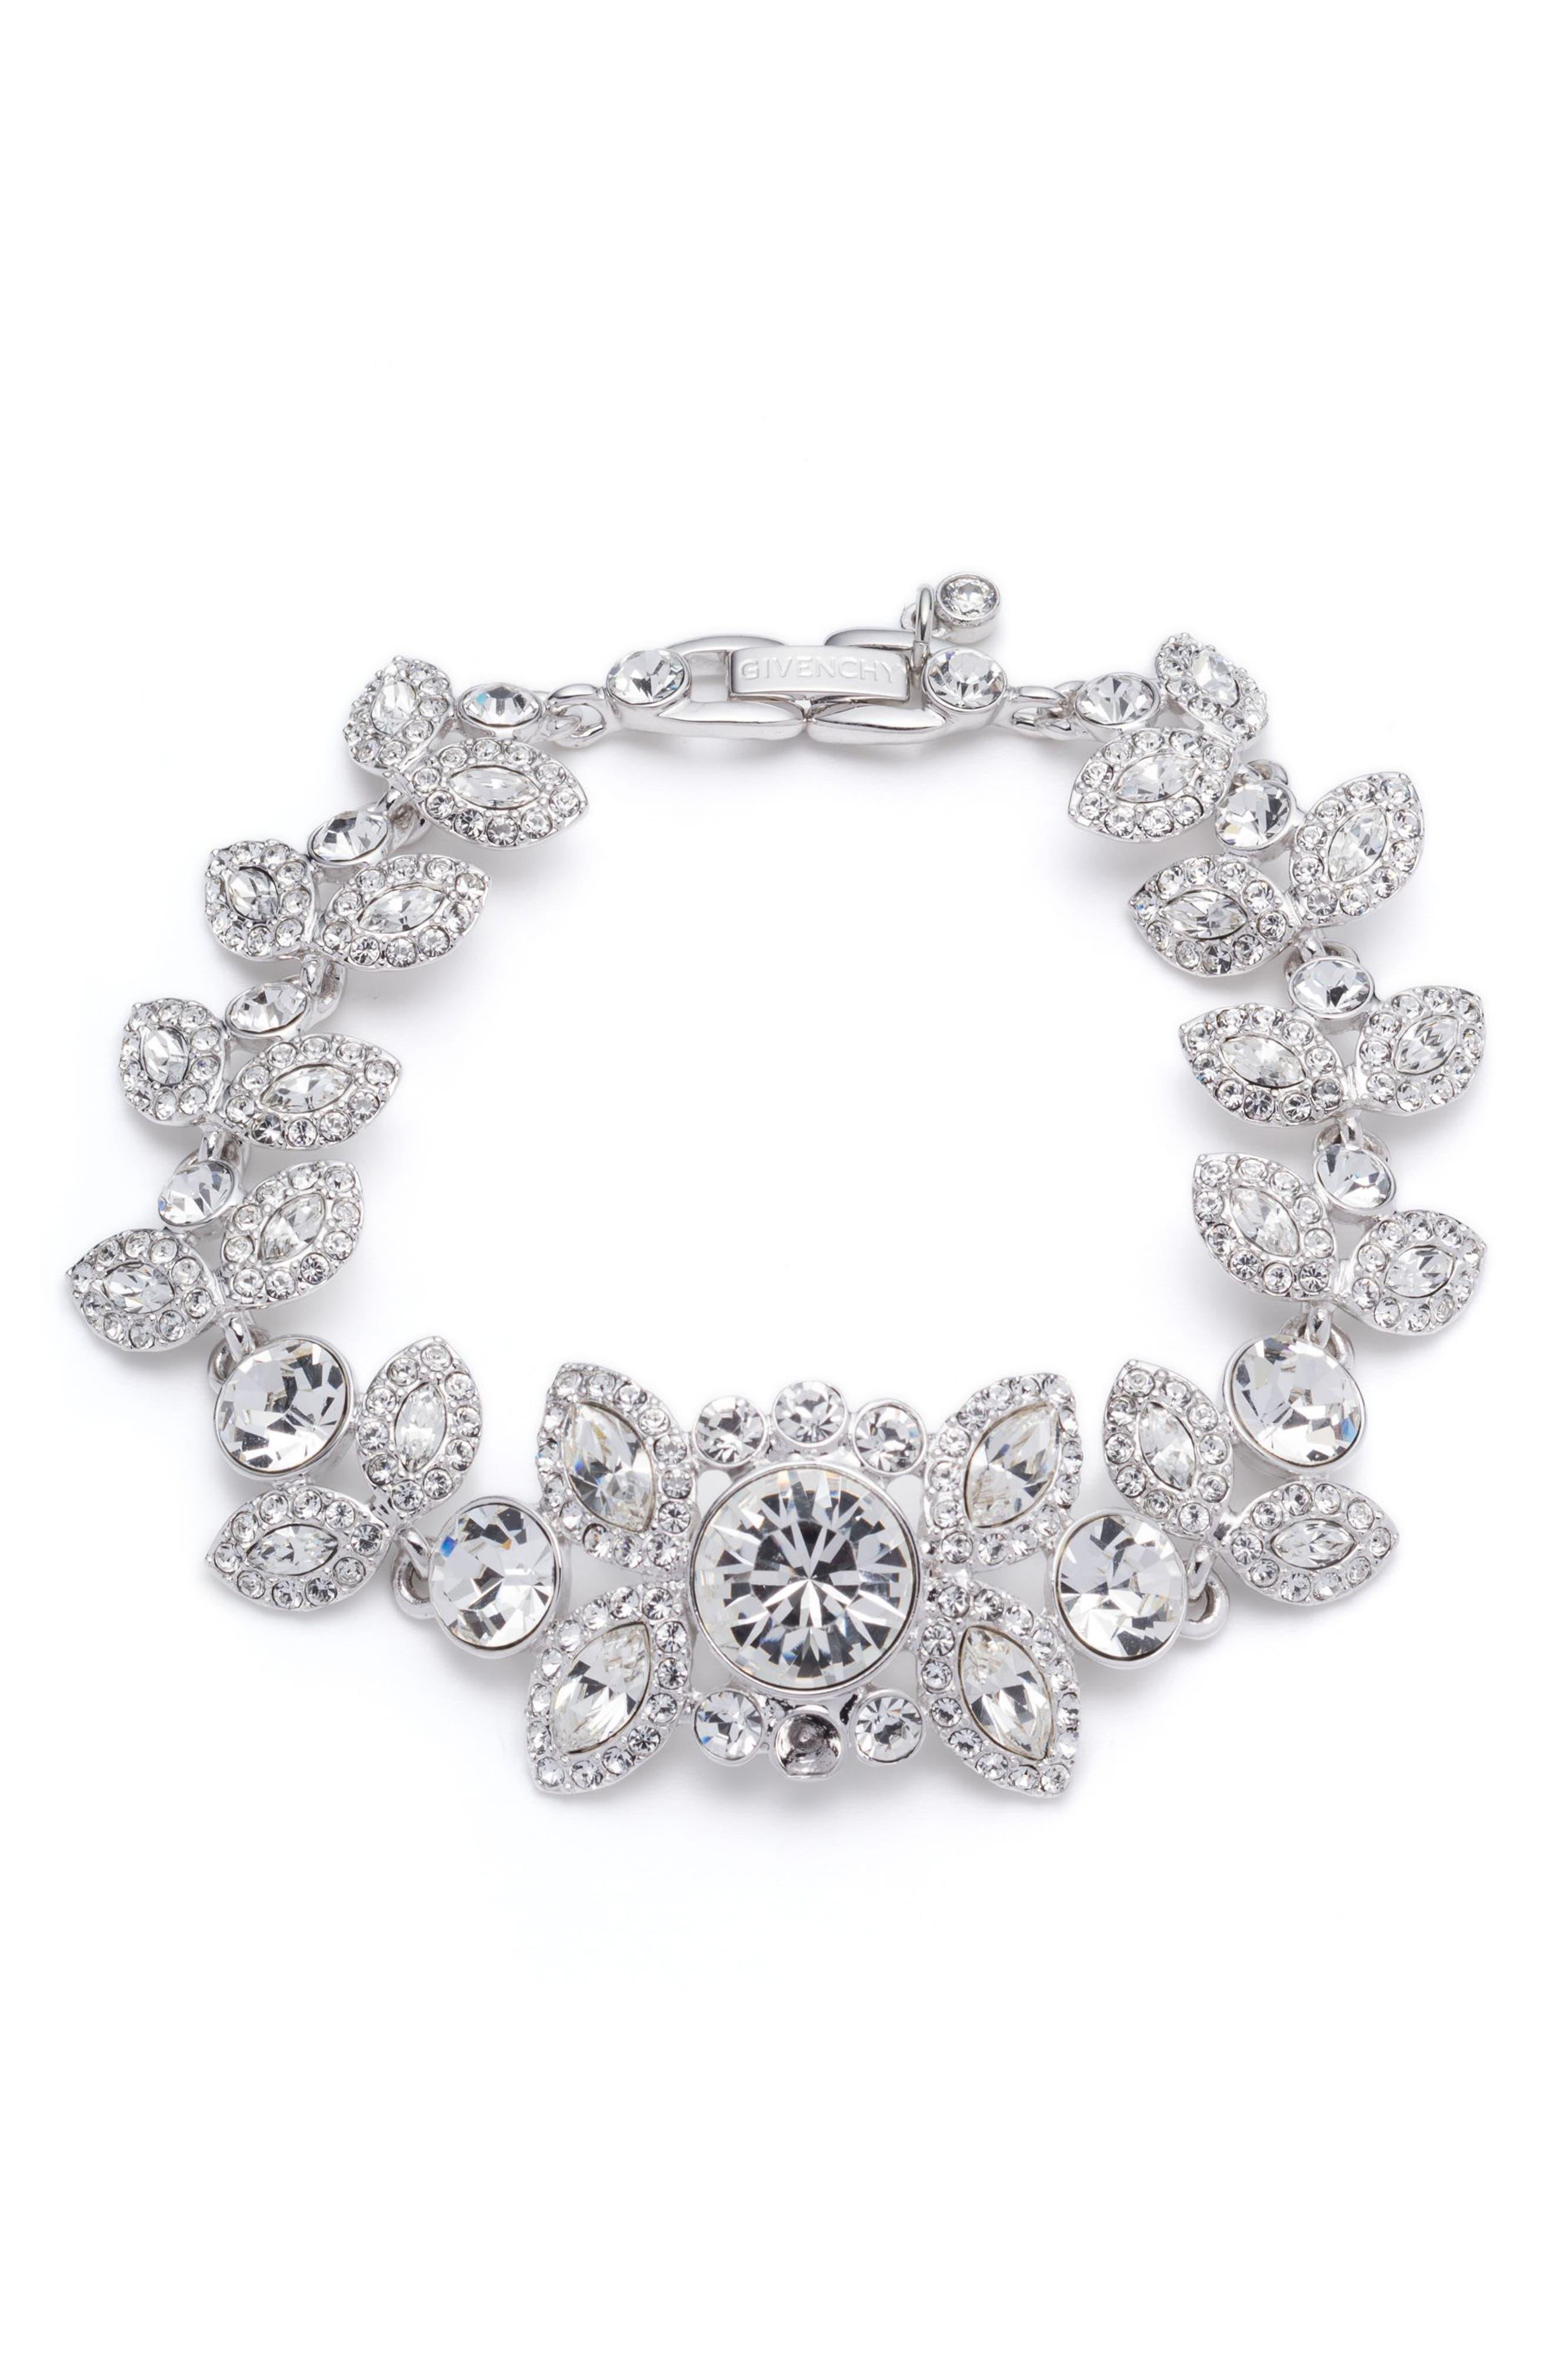 Givenchy Large Crystal Bracelet